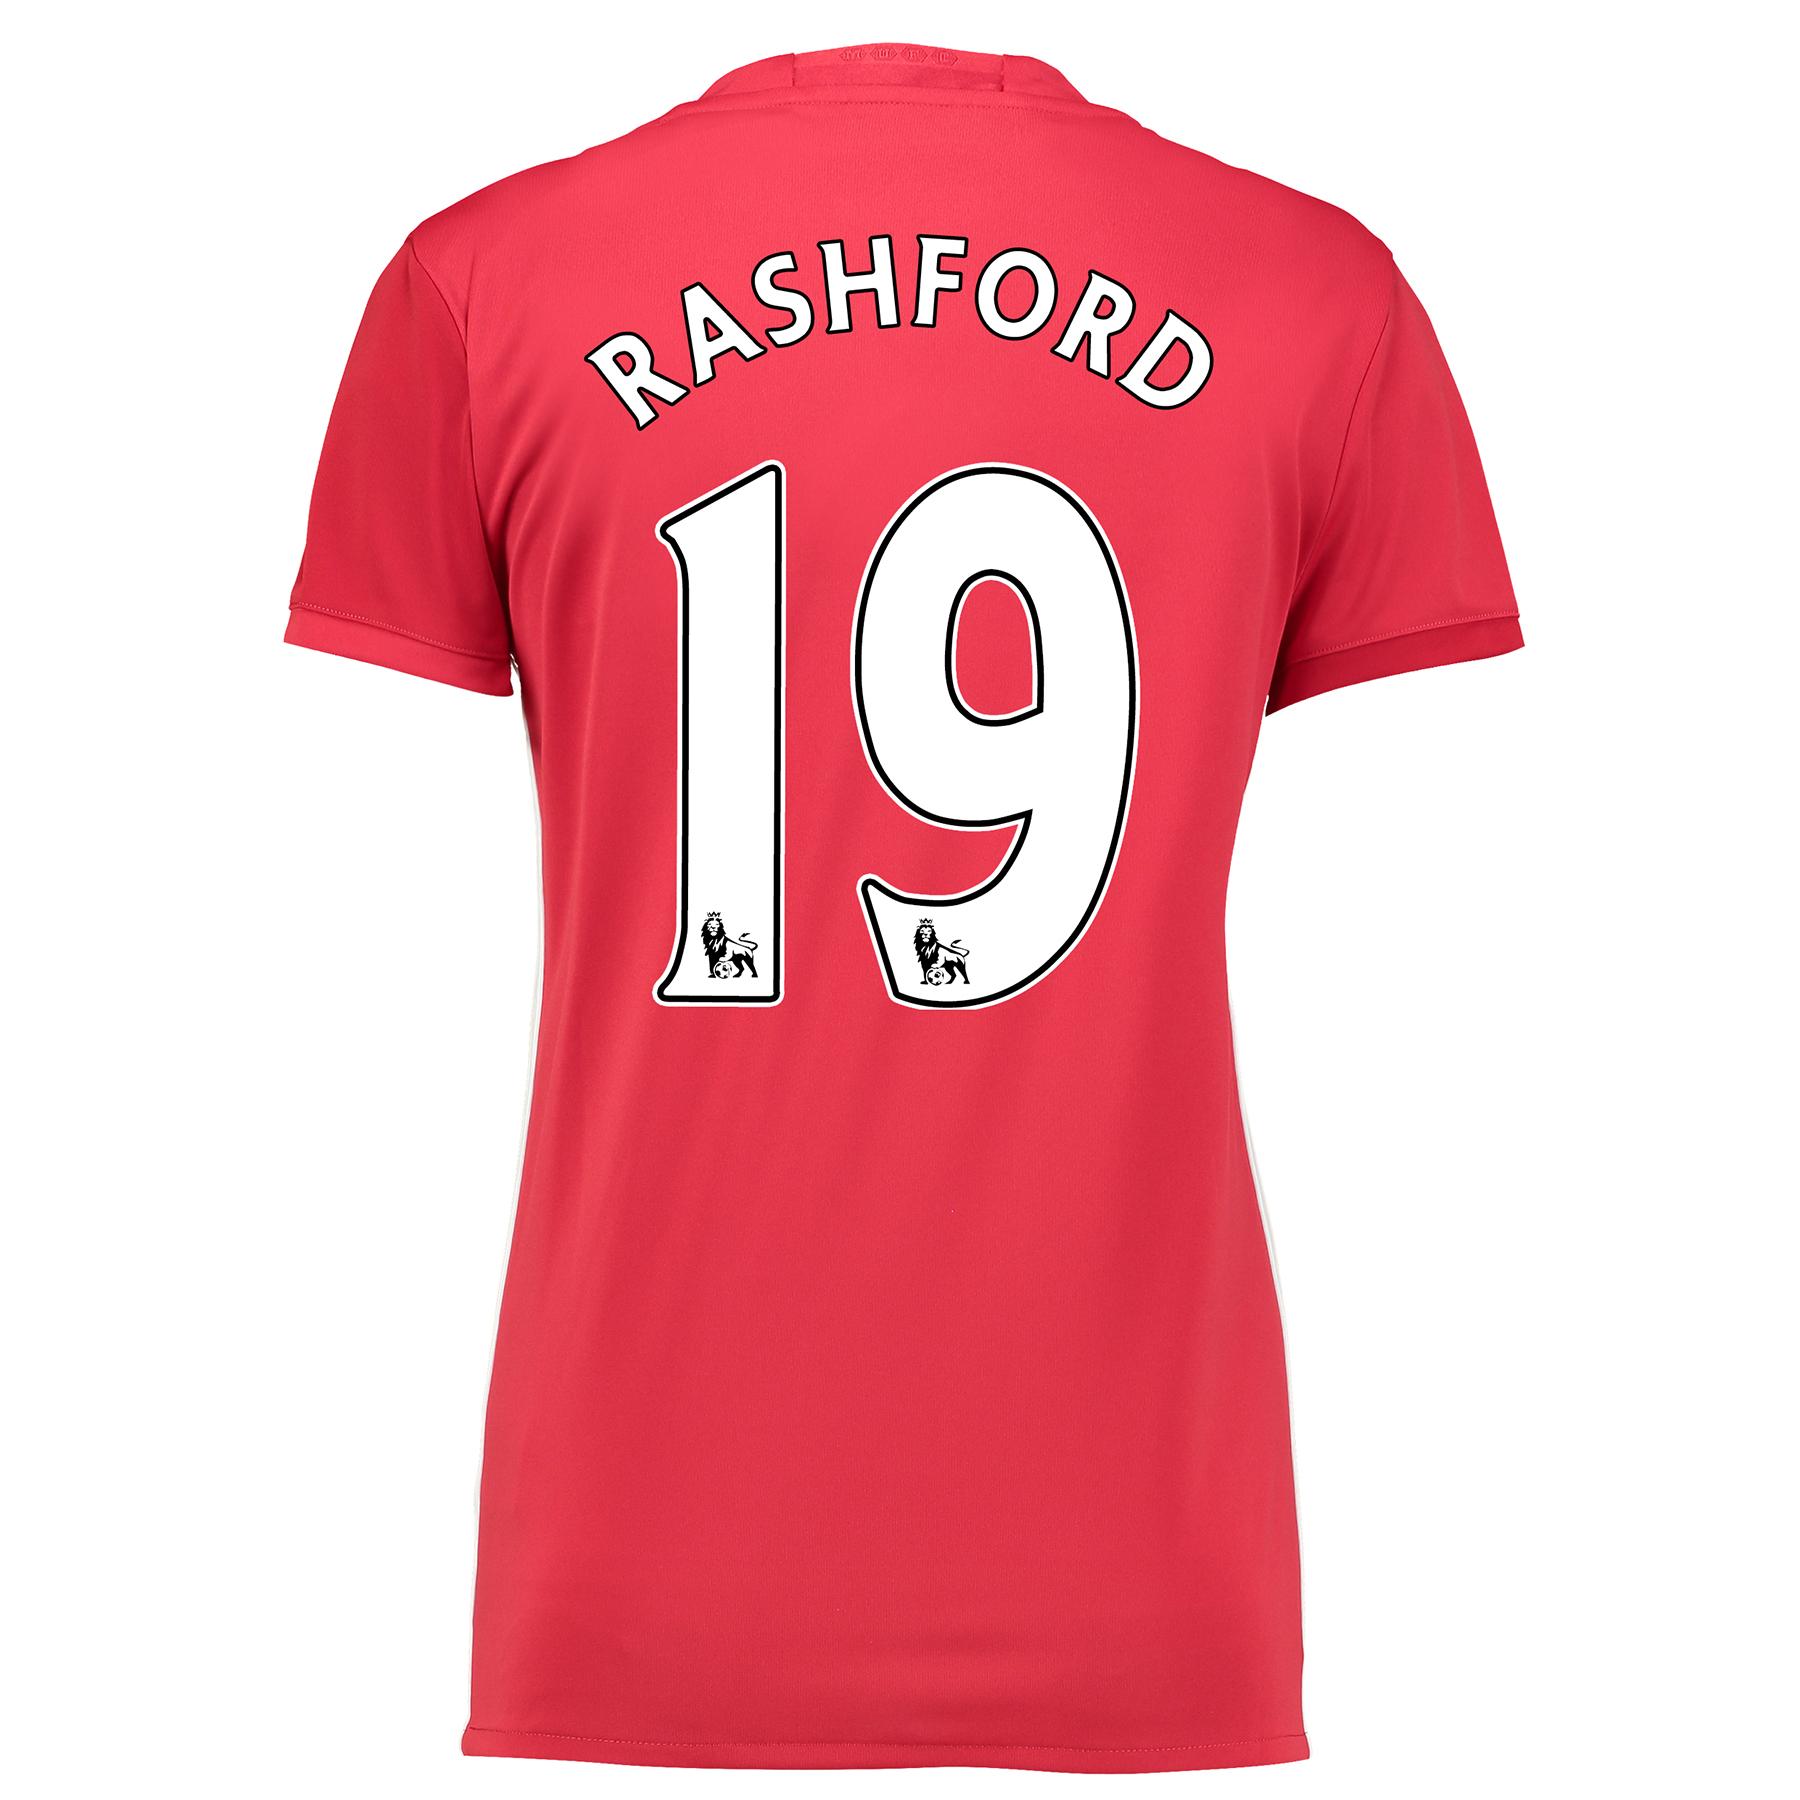 Manchester United Home Shirt 2016-17 - Womens with Rashford 19 printin